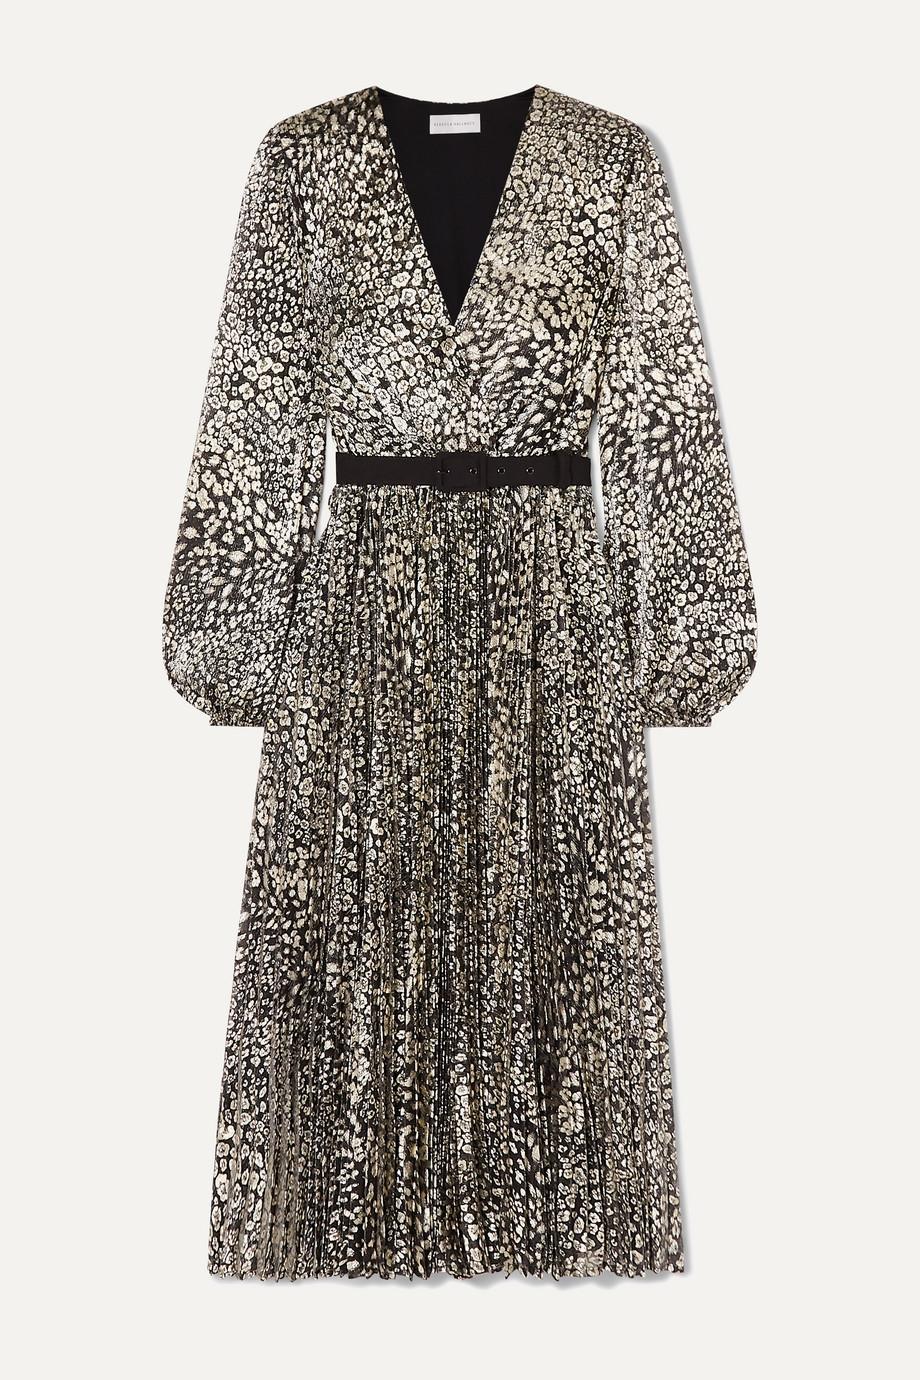 Rebecca Vallance Vienna belted metallic leopard-jacquard midi dress